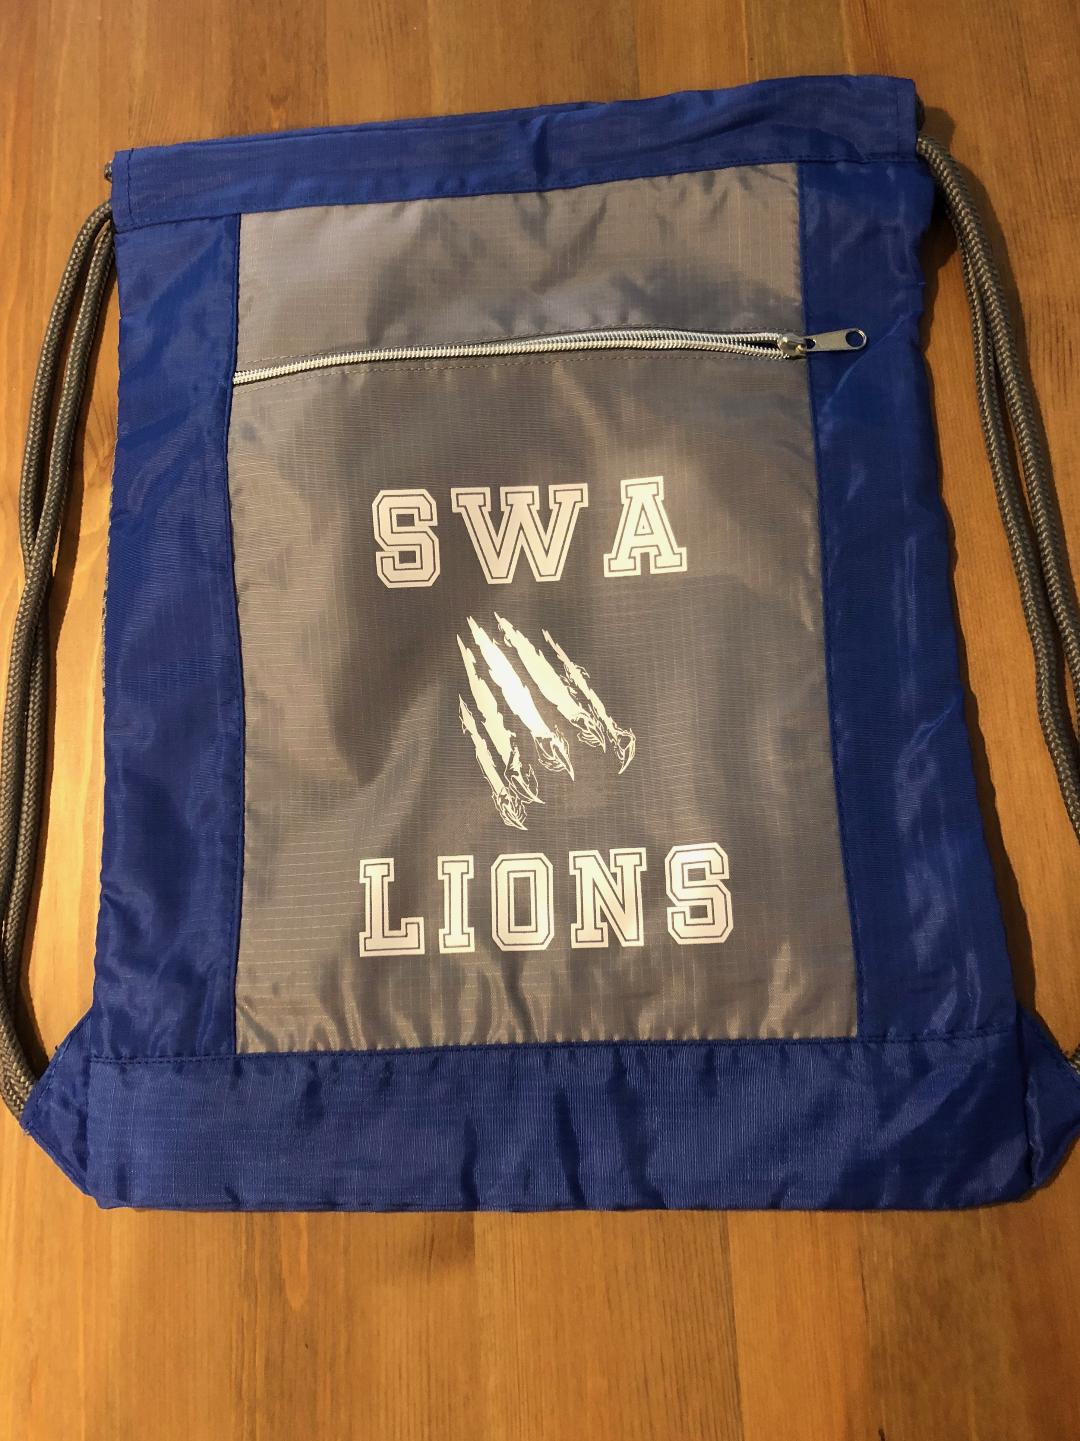 SWA PTO sling bag.jpg